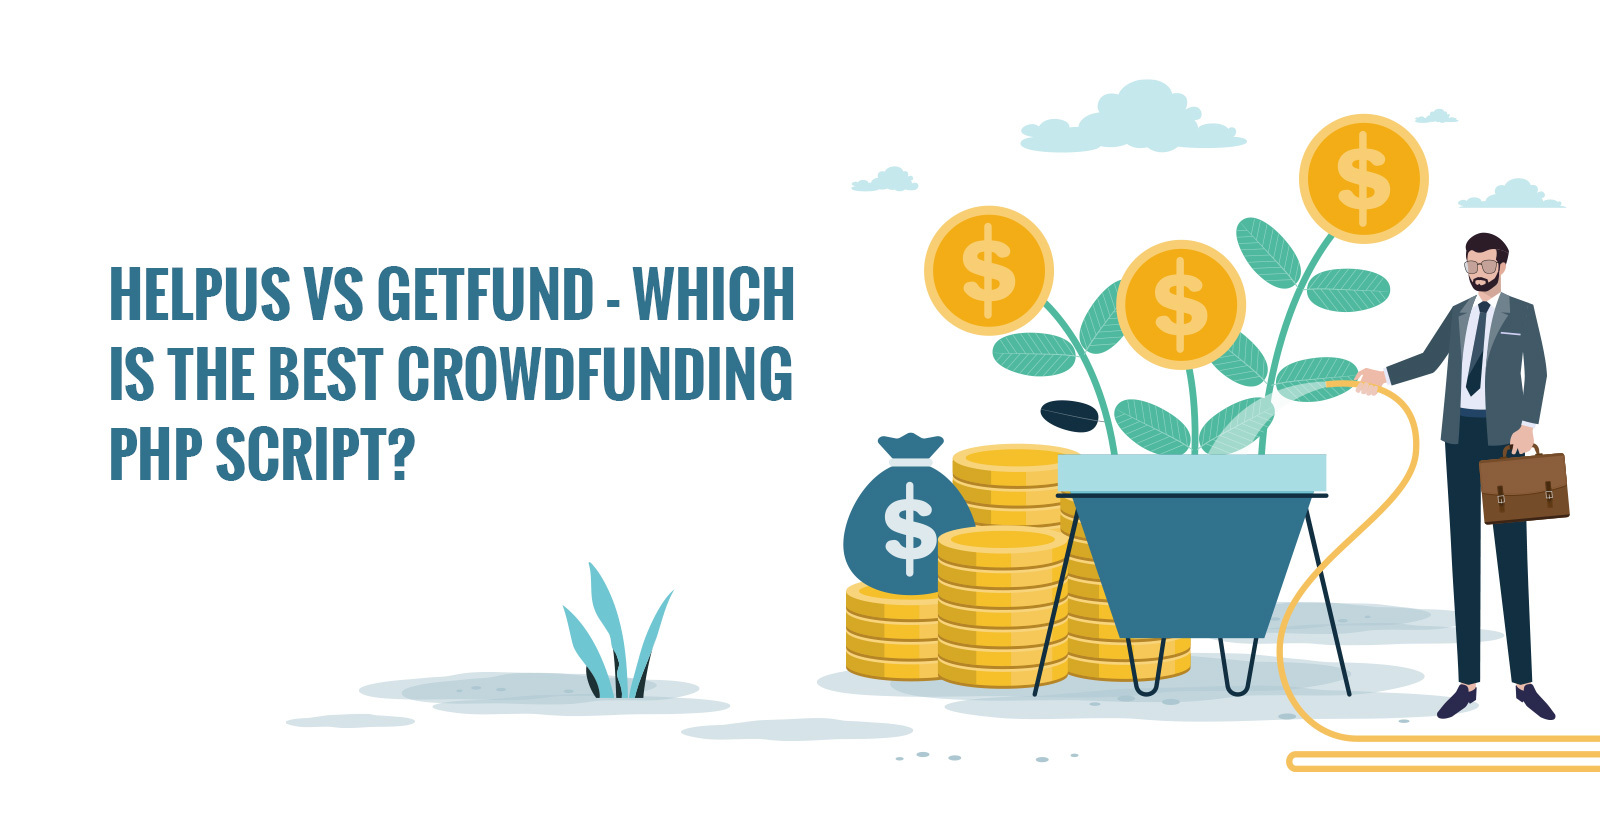 Best crowdfunding PHP script